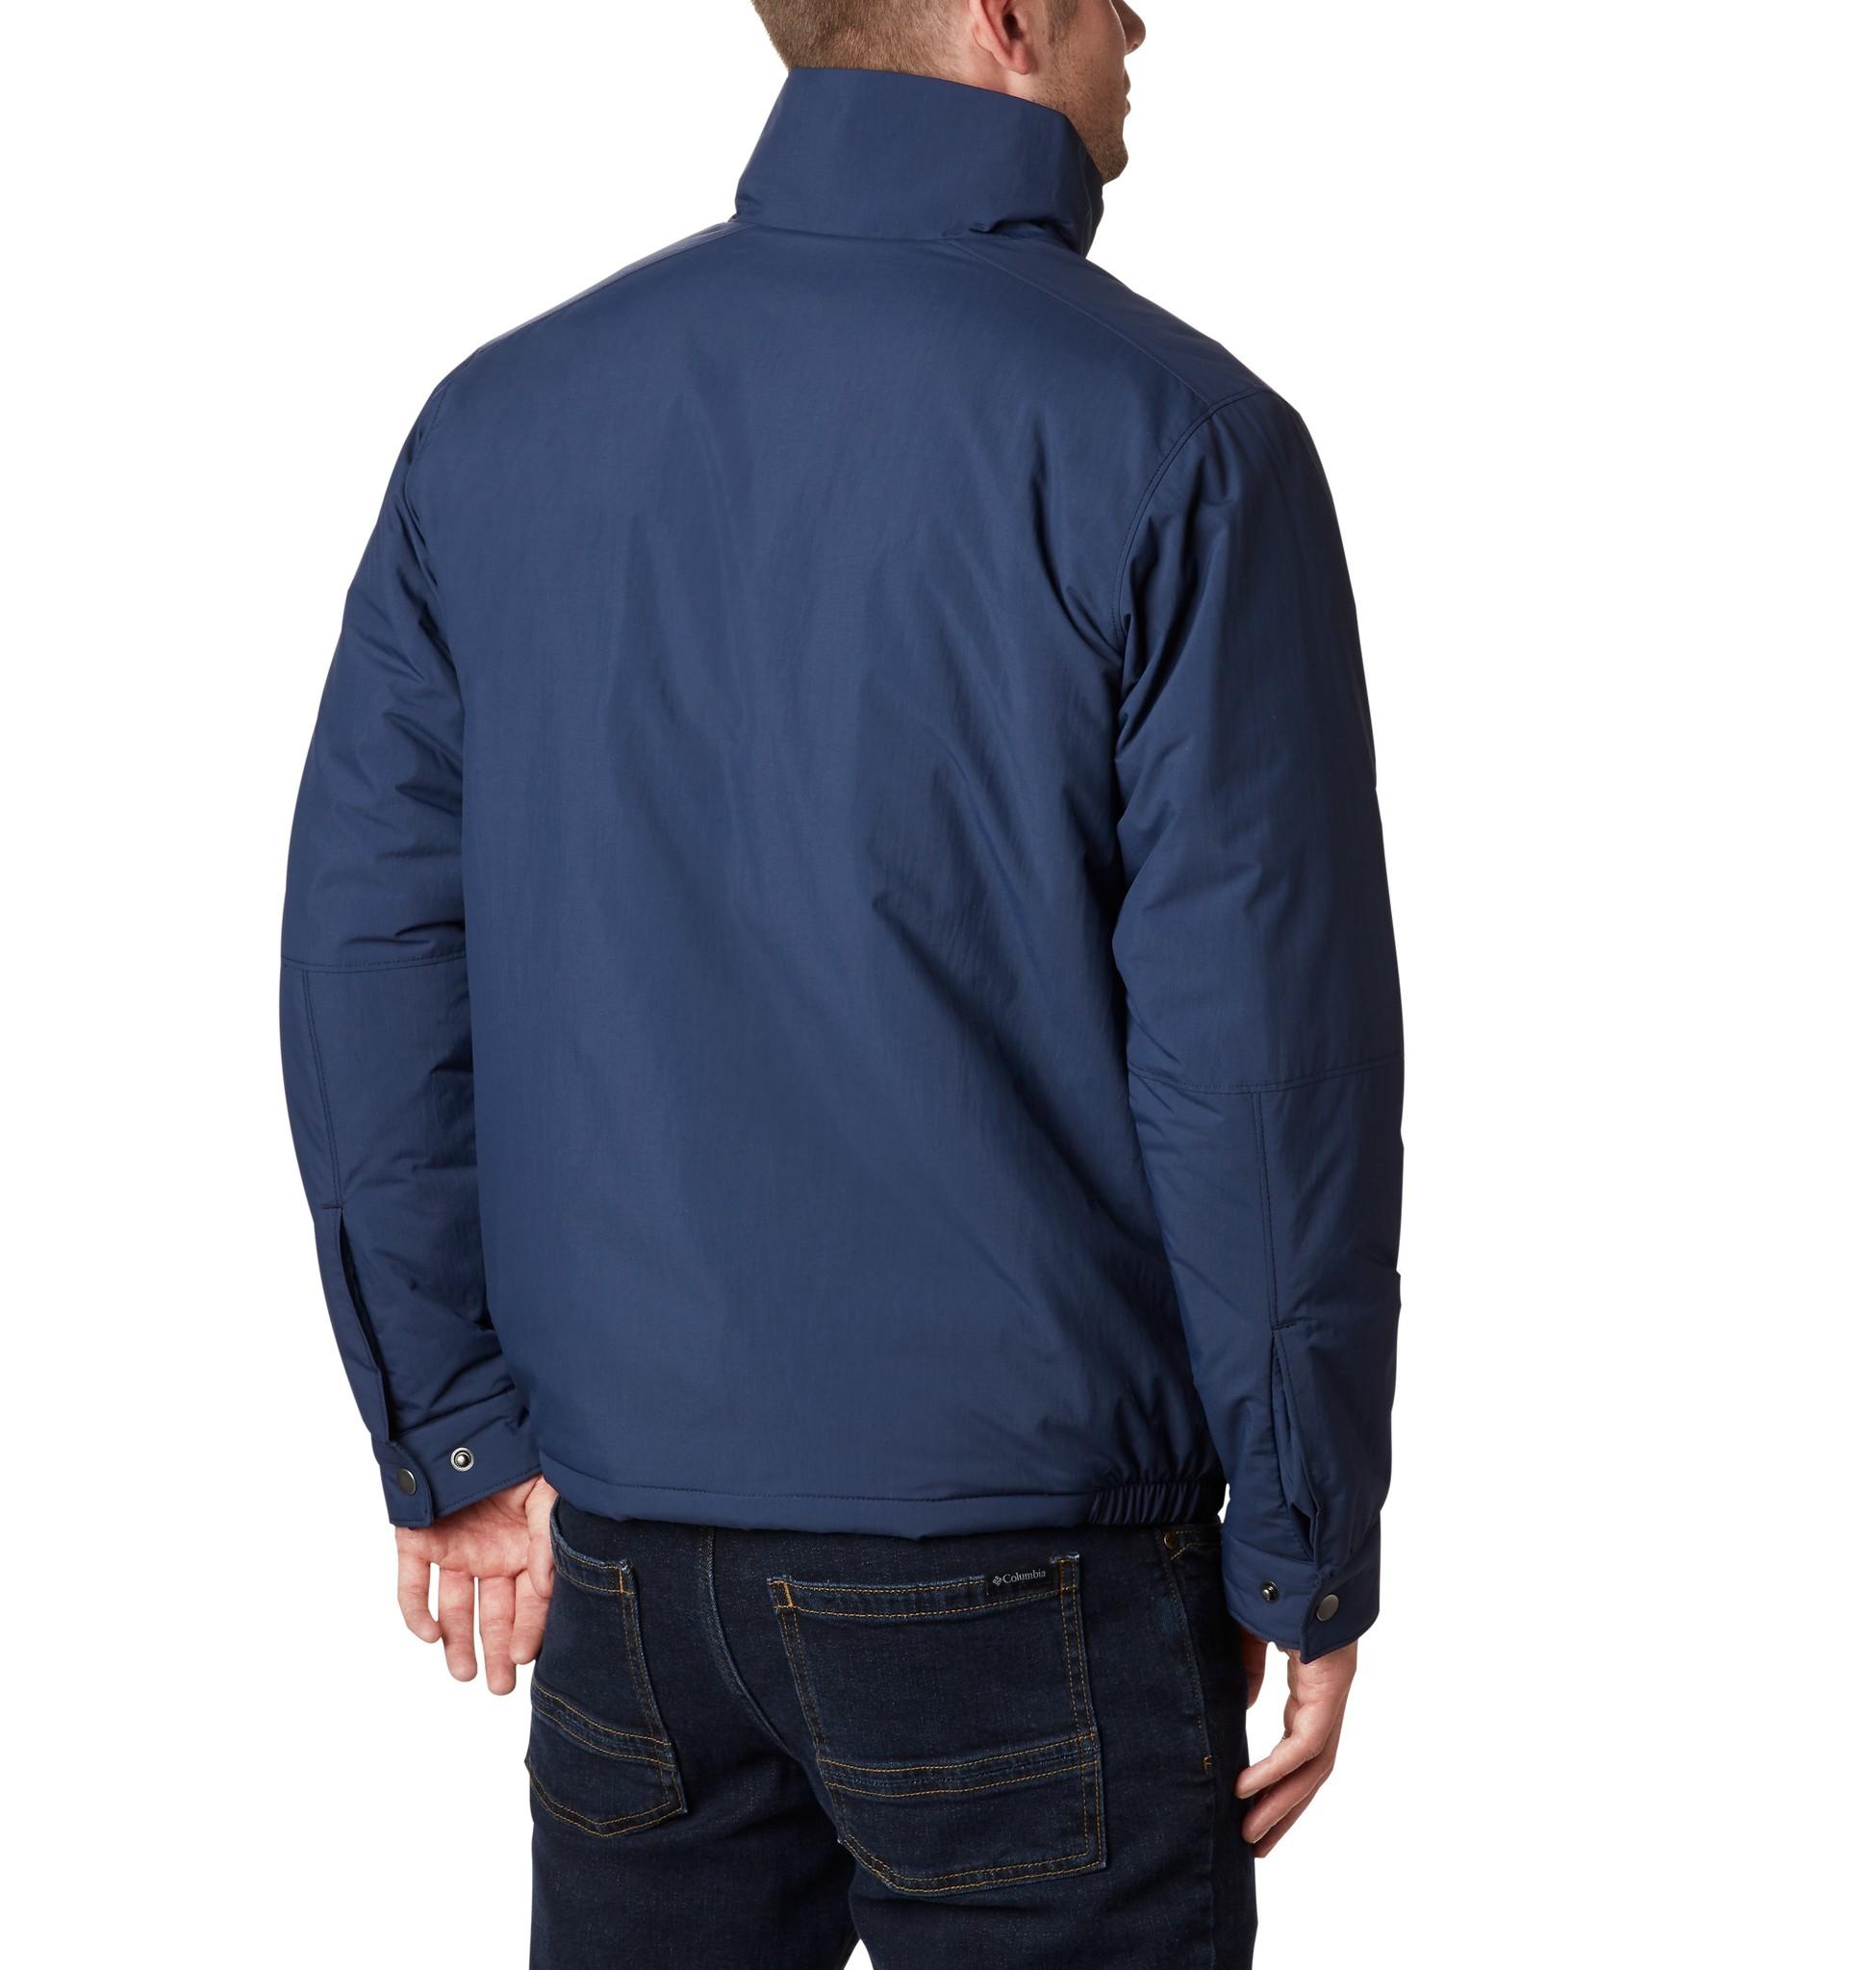 Columbia Sportswear Northern Bound Jacket - Tall